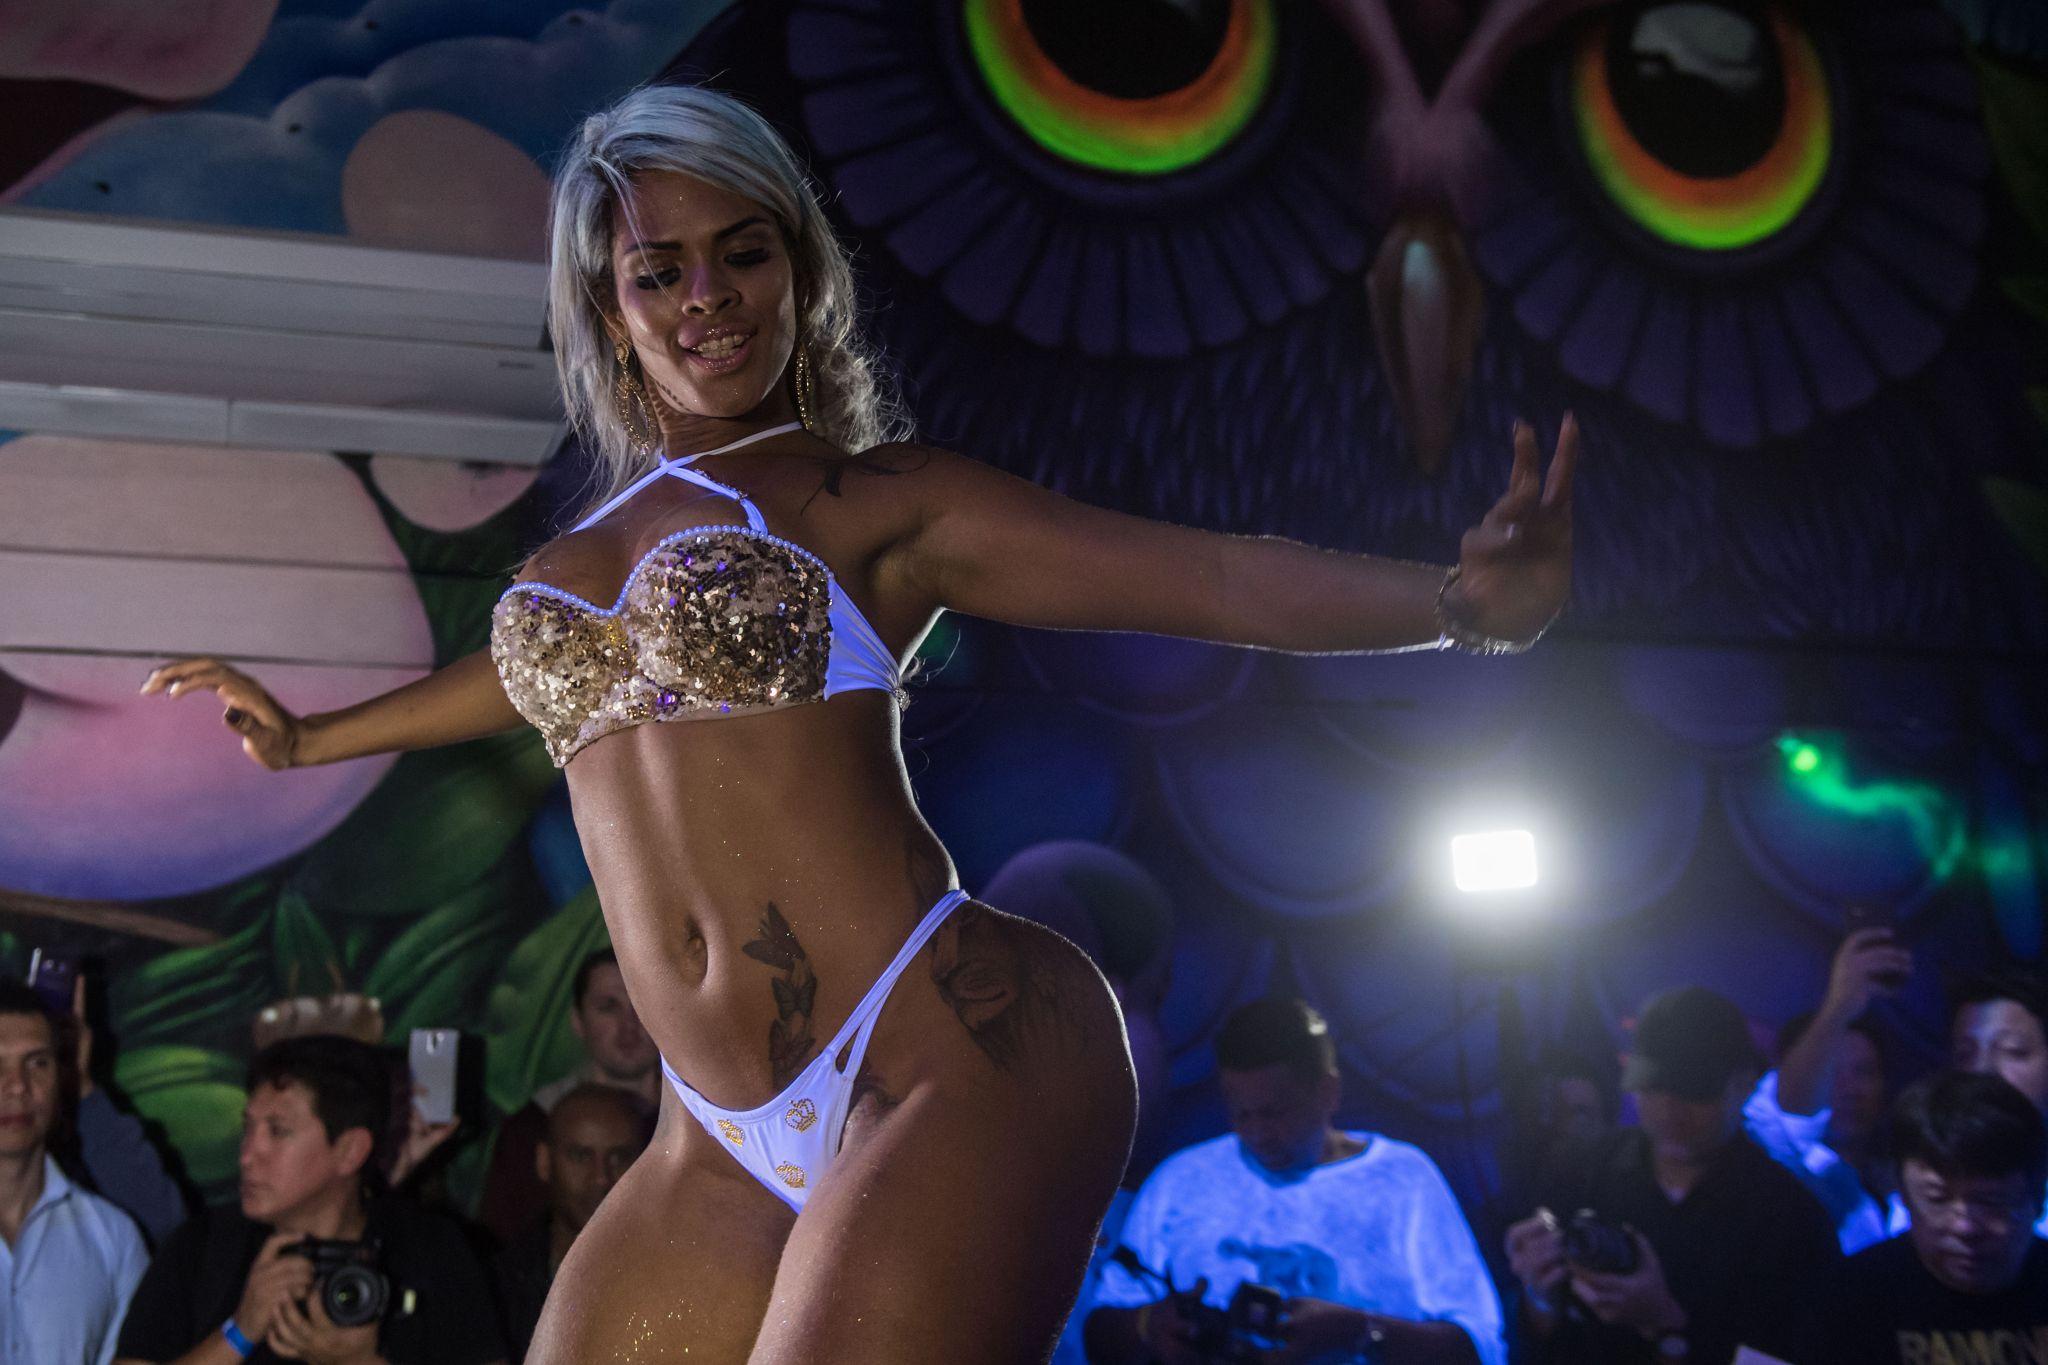 Natalia Borges nudes (15 fotos), hot Erotica, iCloud, butt 2016